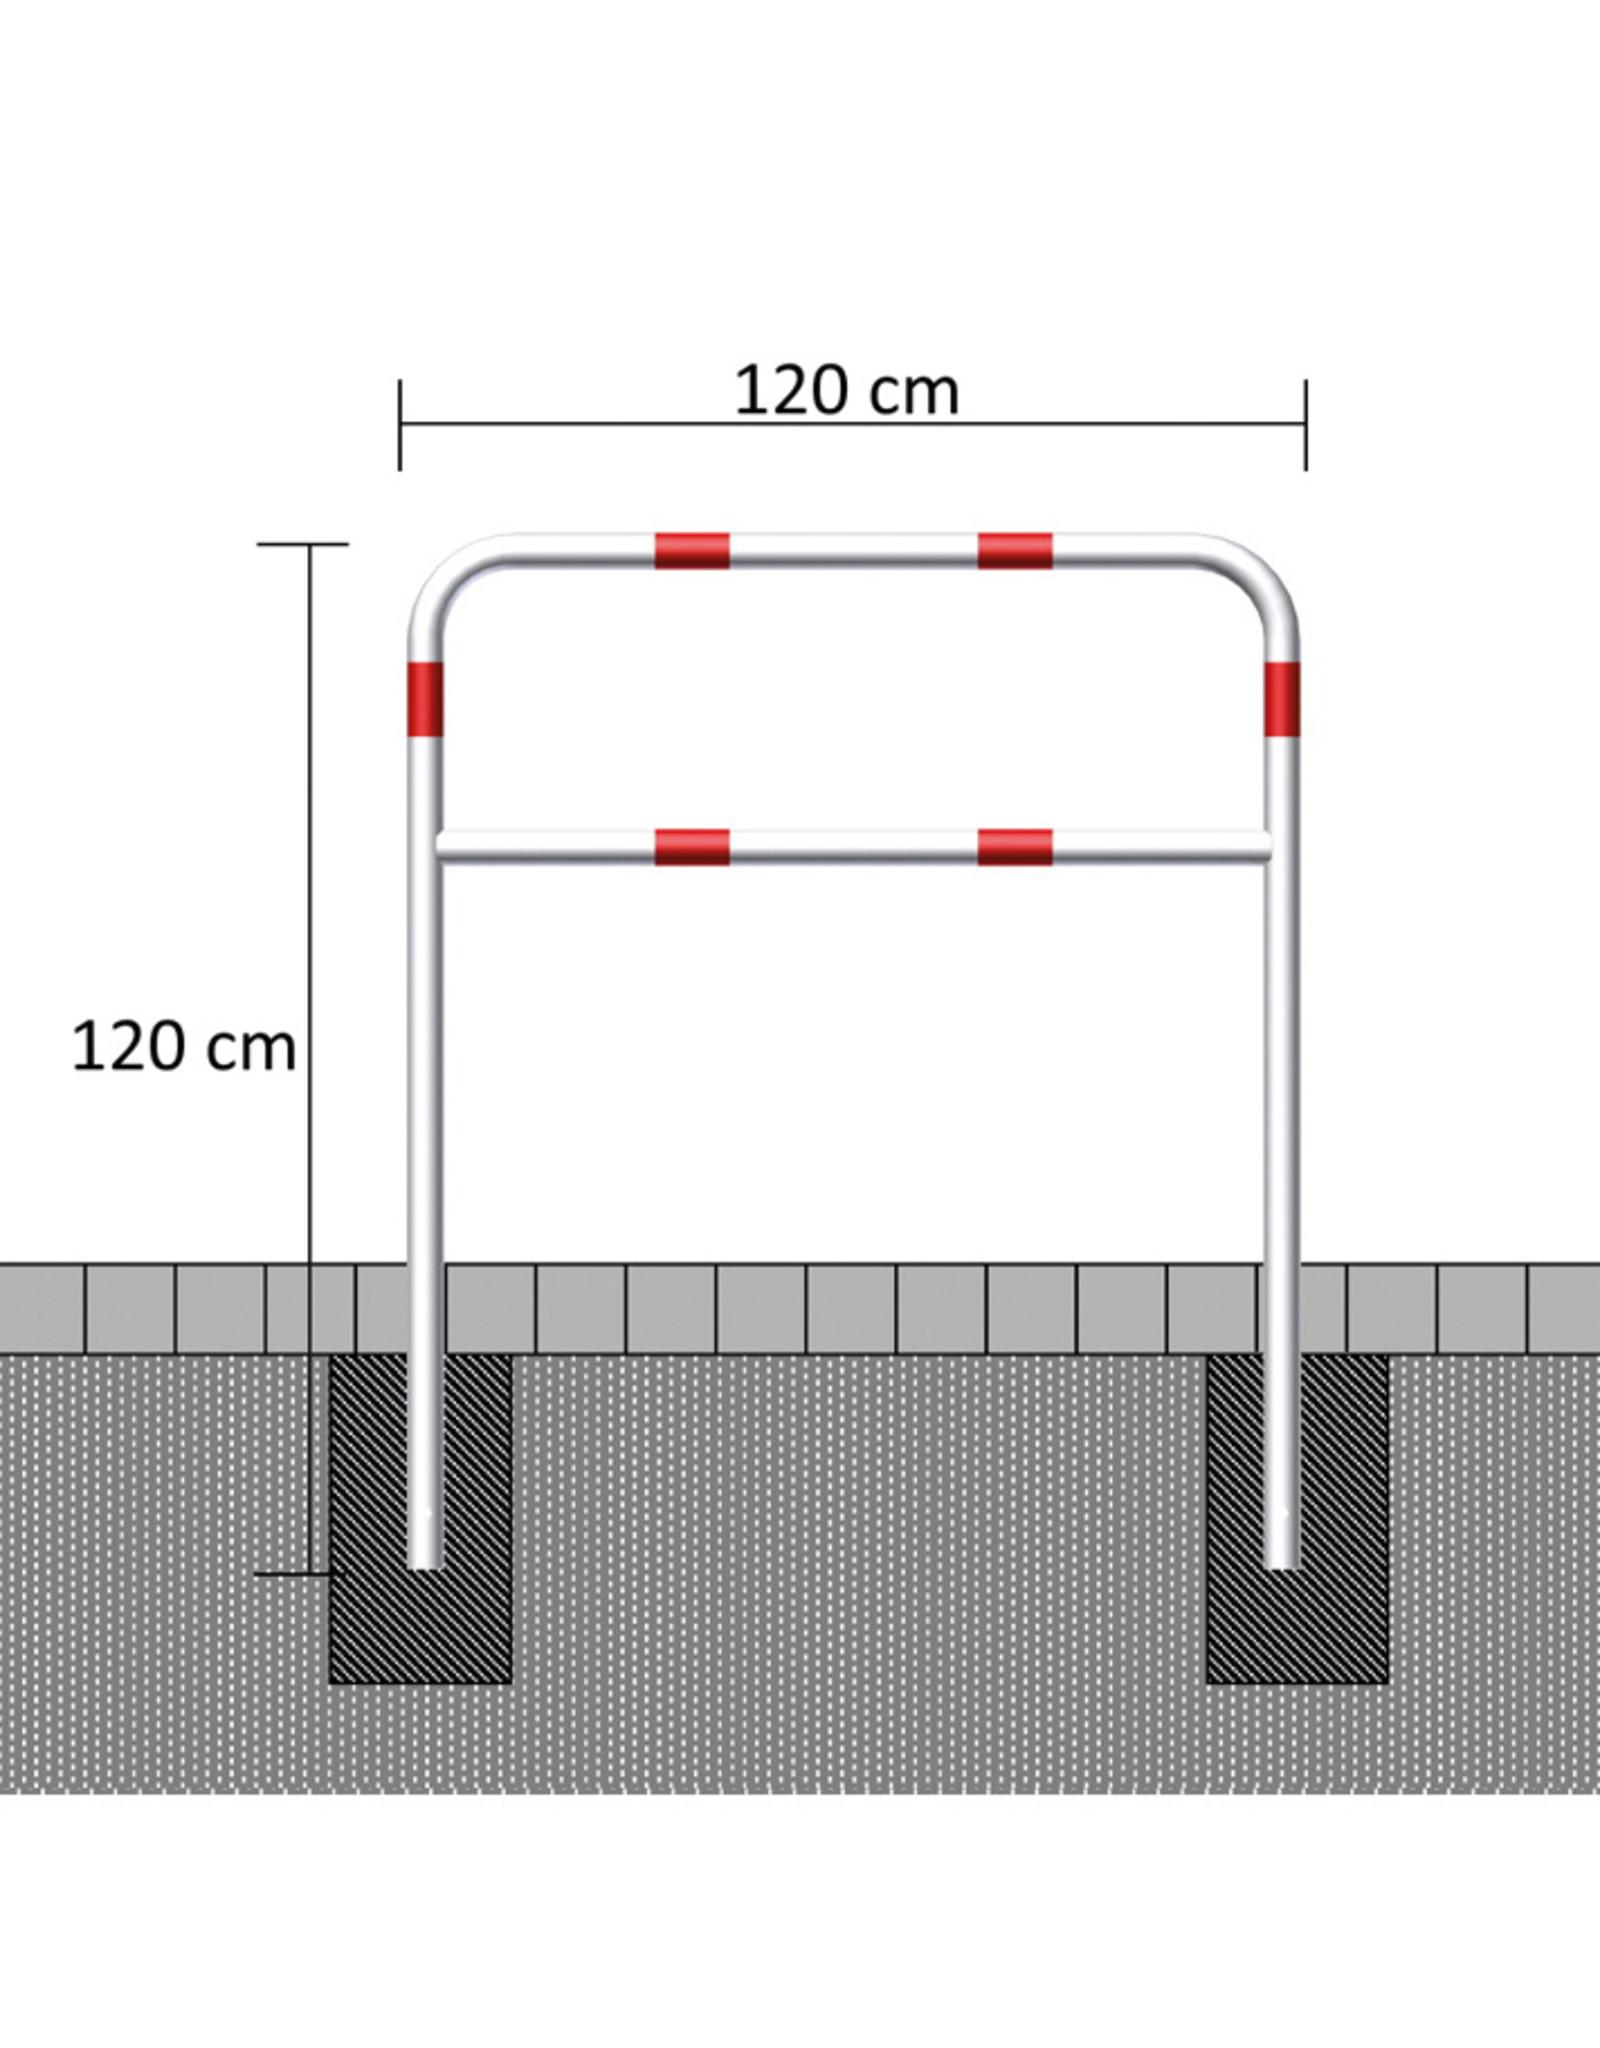 Ri-Traffic | Voetgangerssluis Staal, Rood-Wit, 120 cm x 120 cm